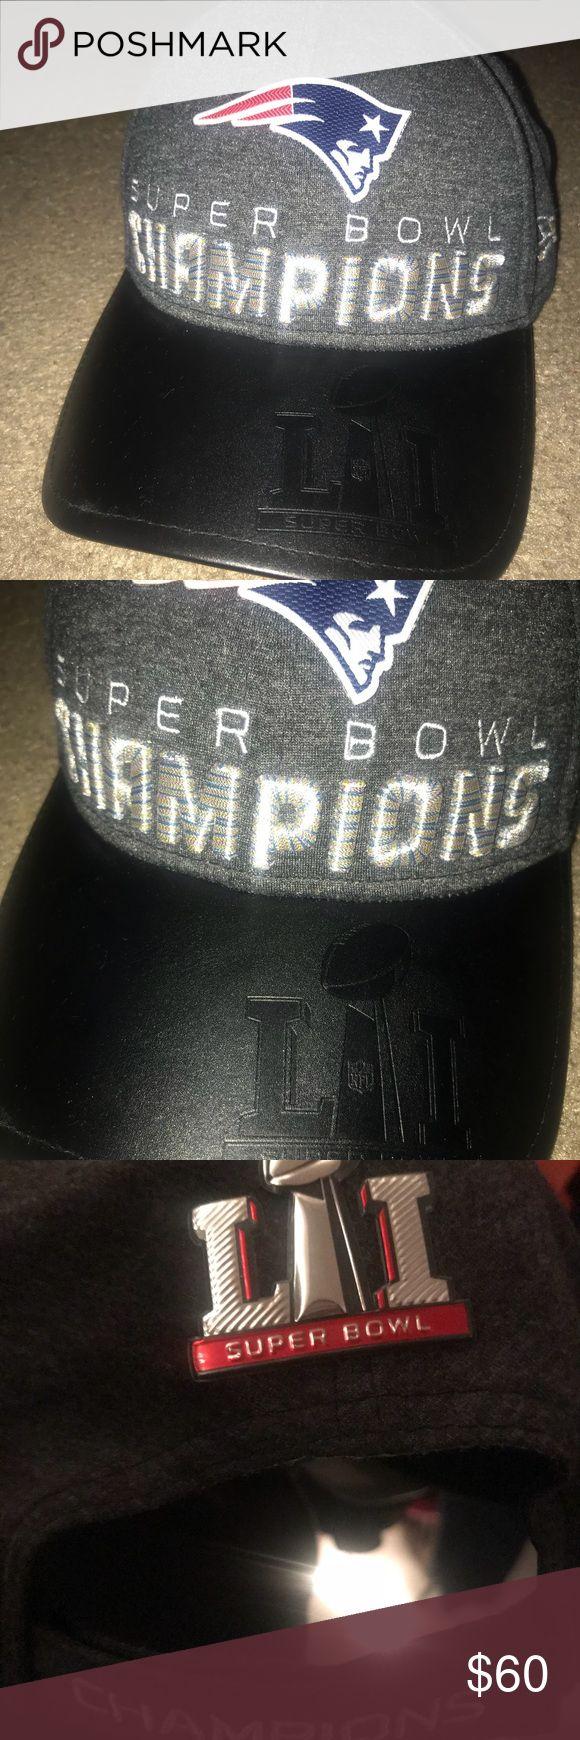 SALE! PATRIOTS SUPERBOWL LI CHAMPIONSHIP HAT Never worn! Adjustable strap! Go pats!!! 🏈 Champion Accessories Hats